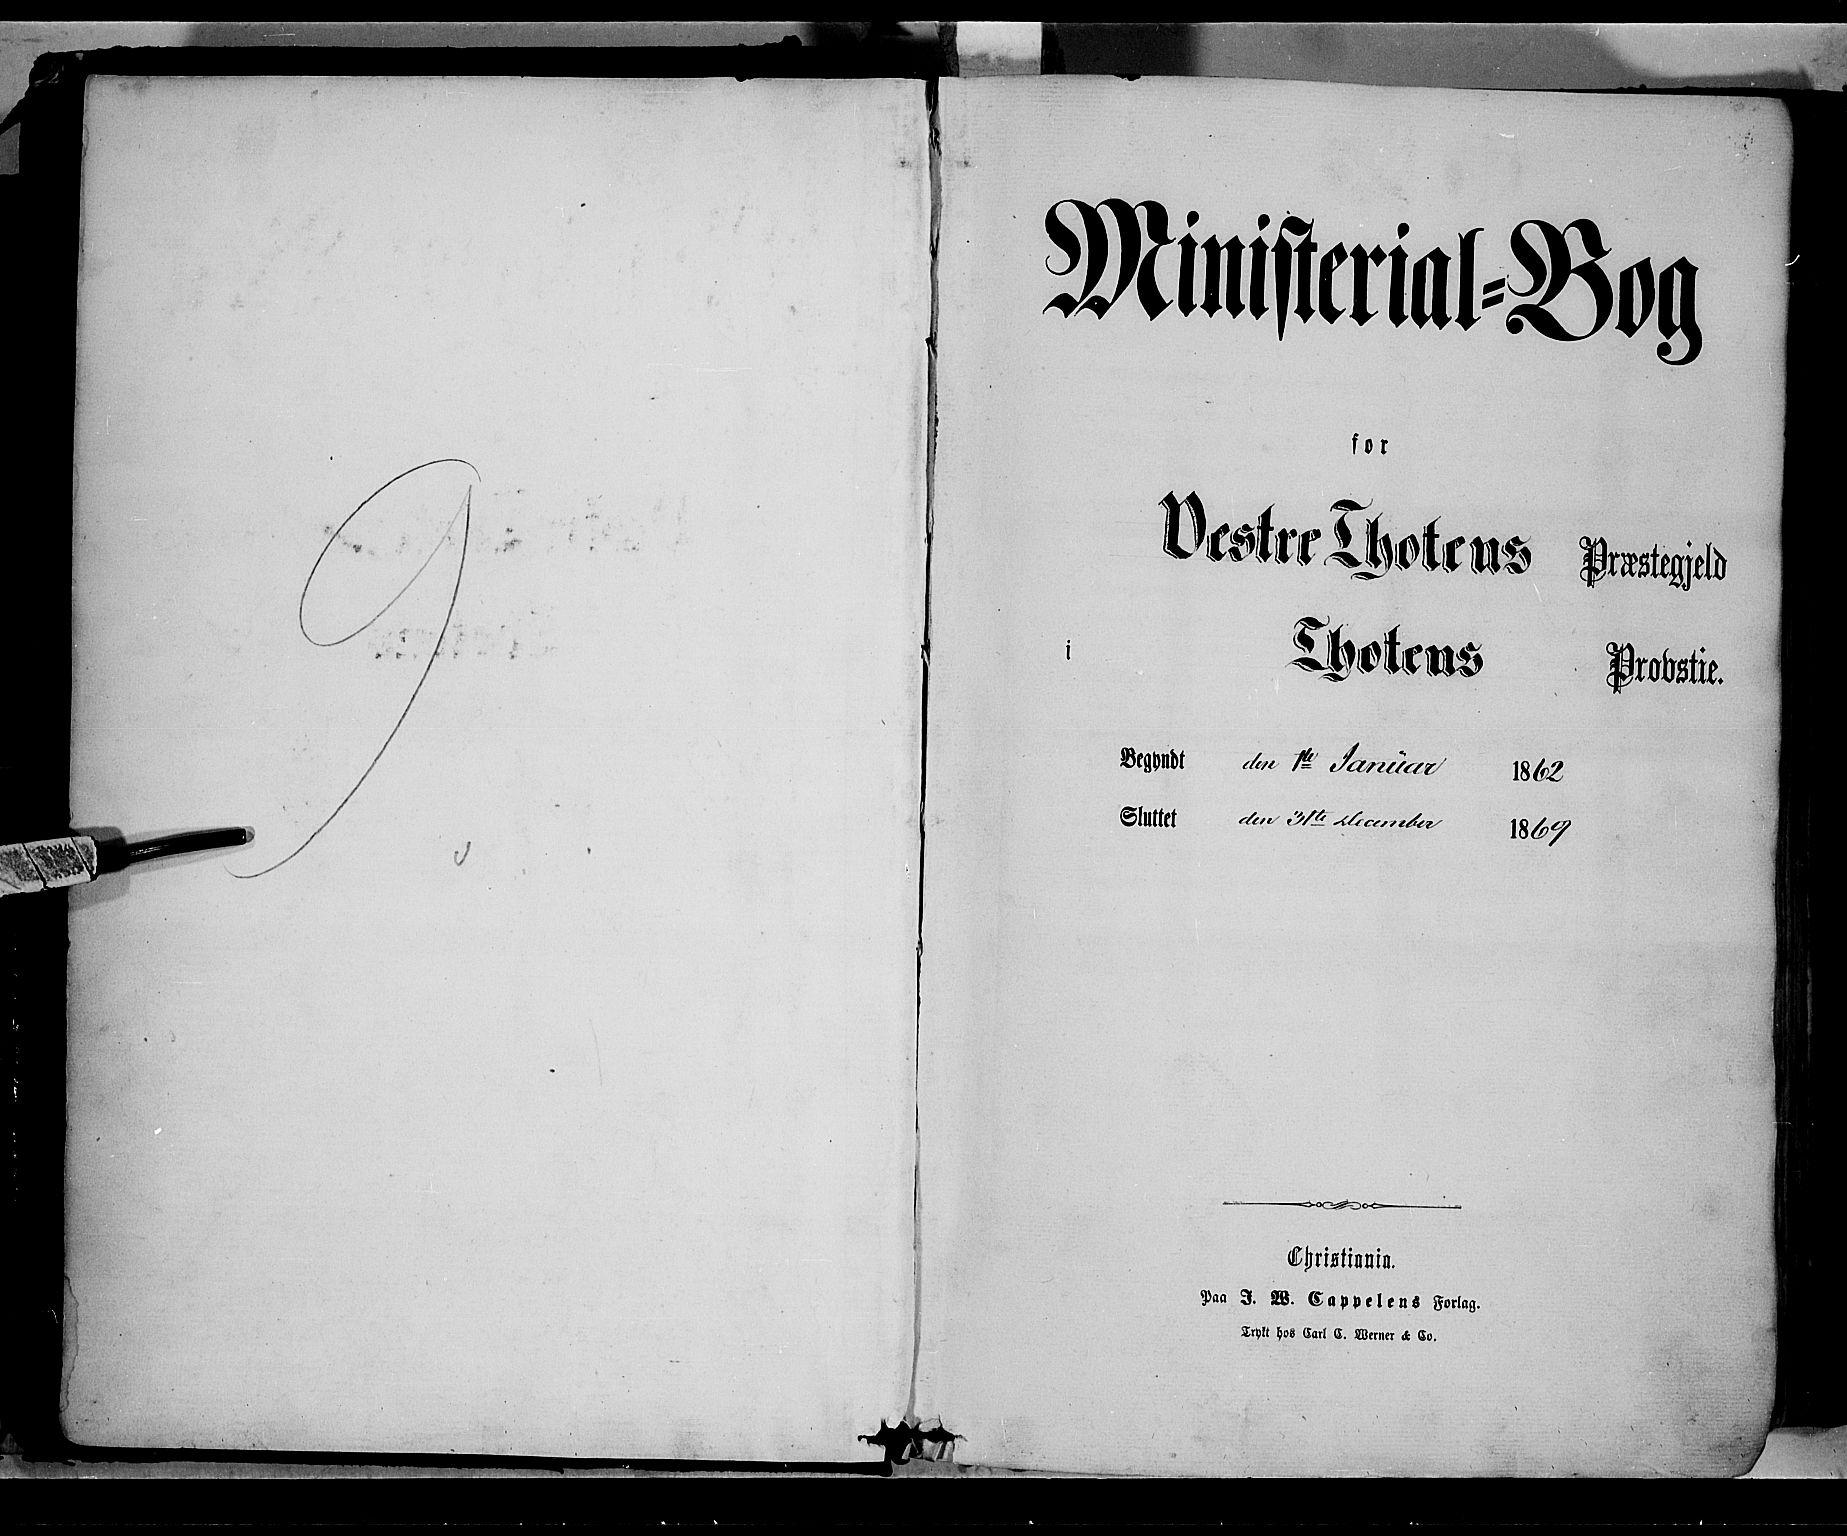 SAH, Vestre Toten prestekontor, Ministerialbok nr. 7, 1862-1869